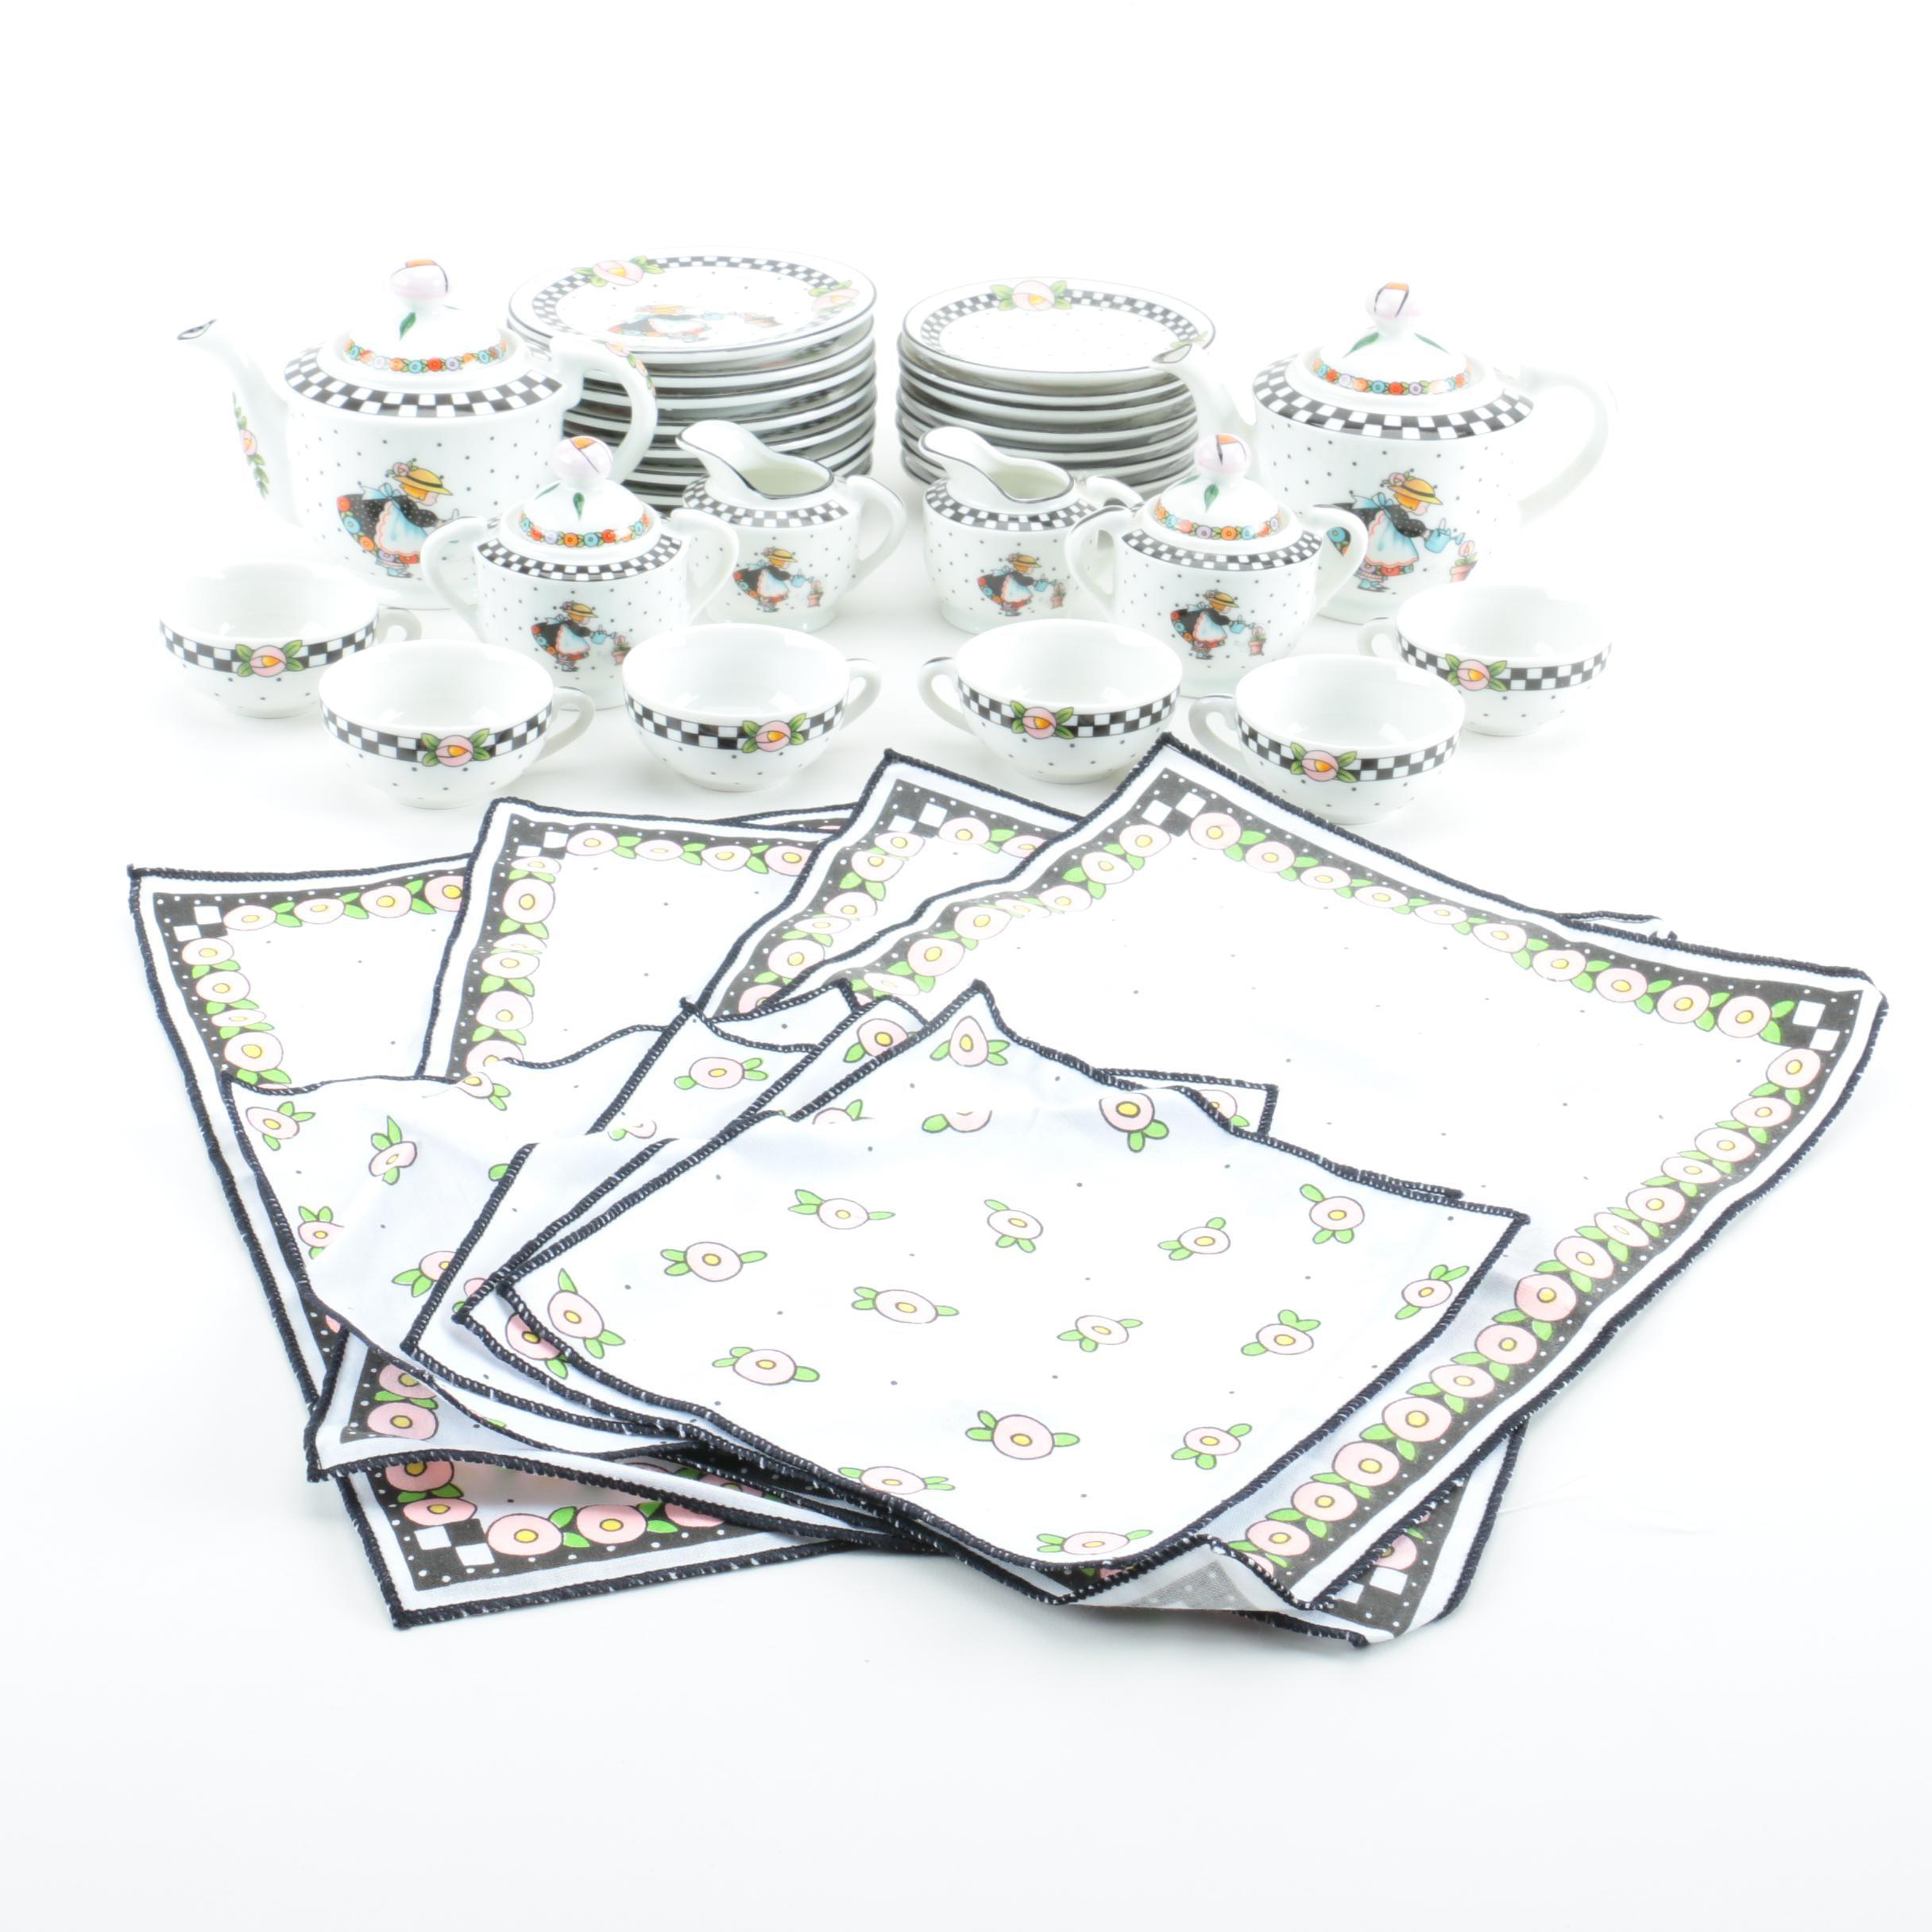 Ceramic Tea Set by Mary Engelbreit